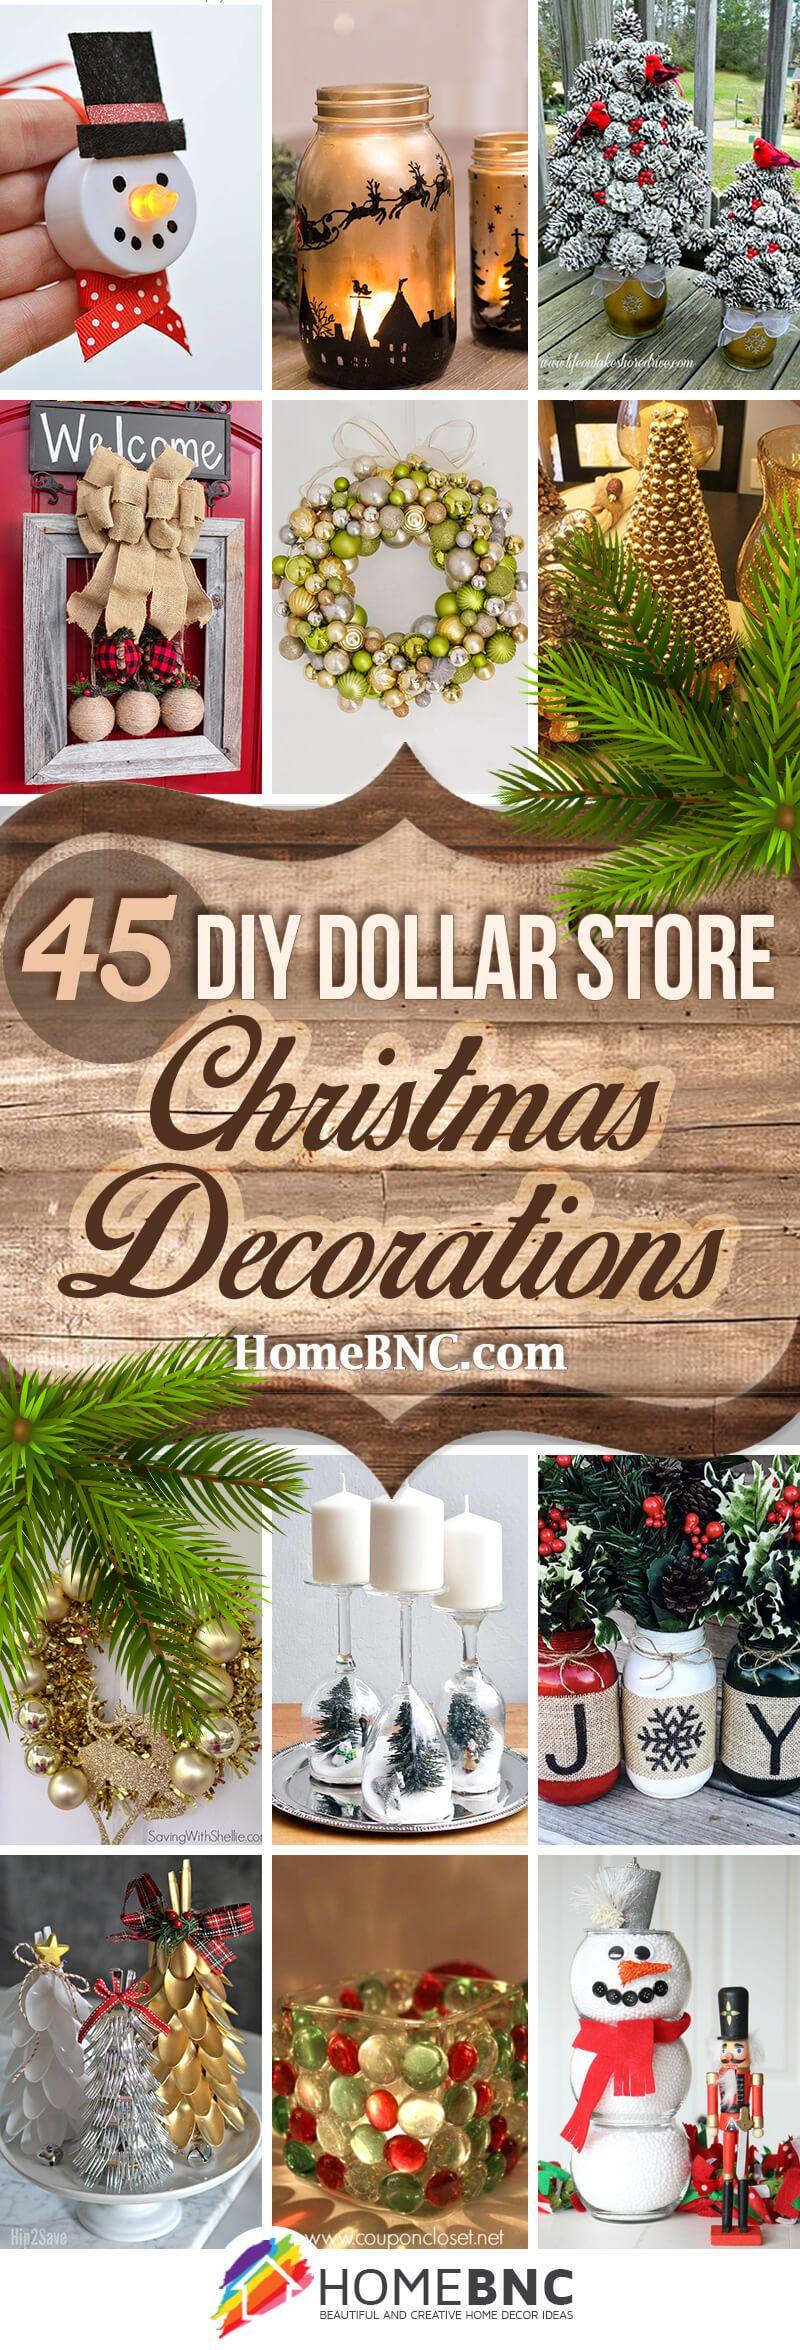 45 Easy Diy Dollar Store Christmas Decorations For Decorating On A Budget Dollar Store Christmas Decorations Christmas Crafts Decorations Dollar Store Christmas Crafts